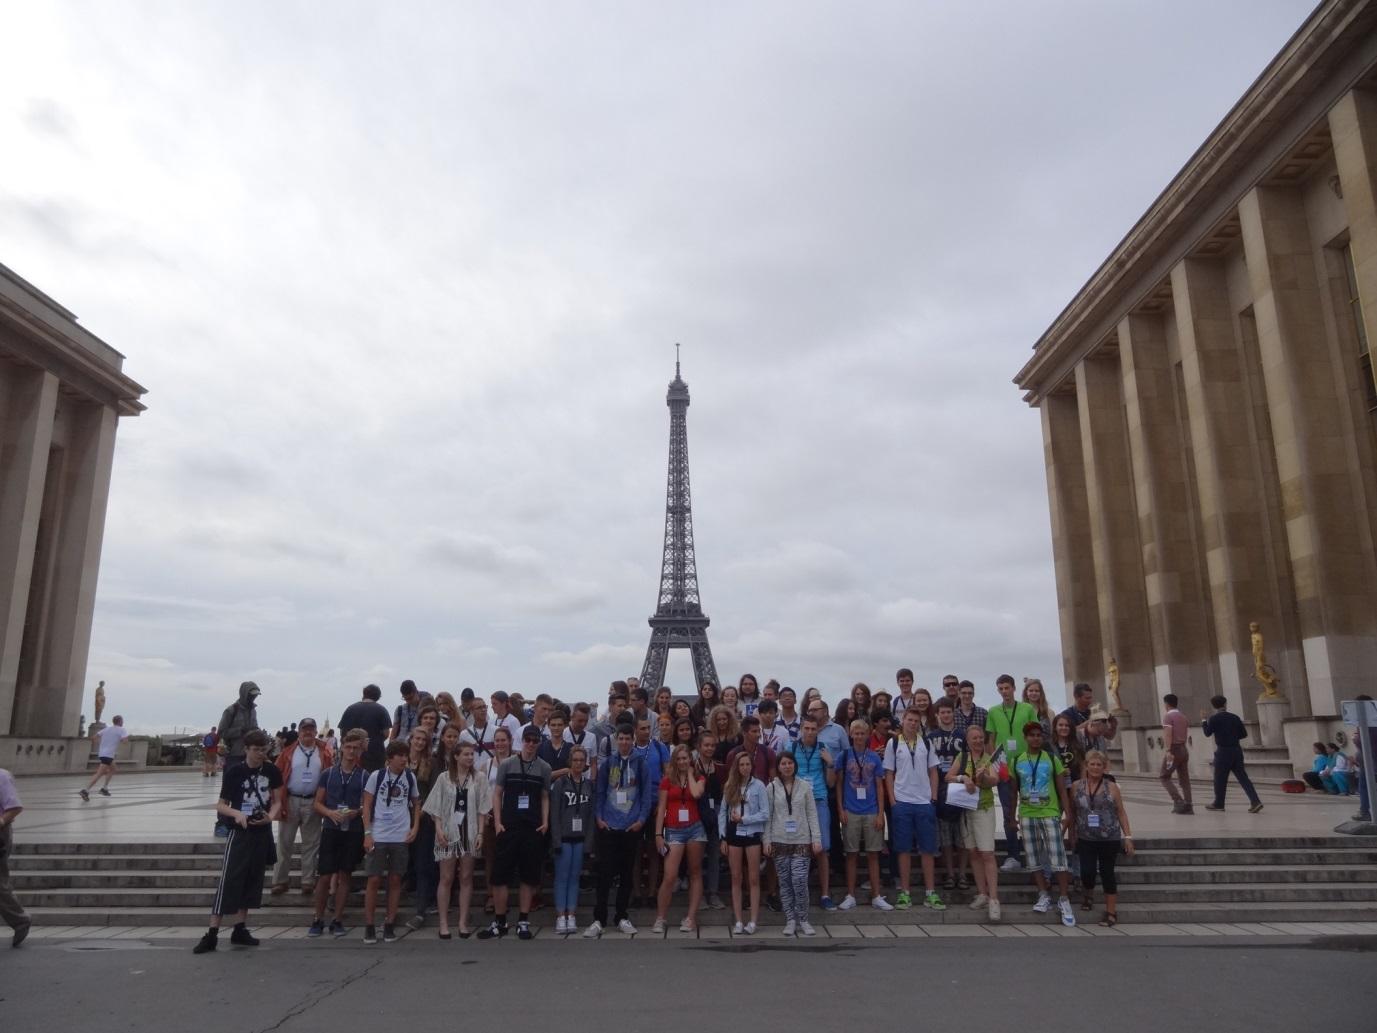 IPA - International Youth Gatherings